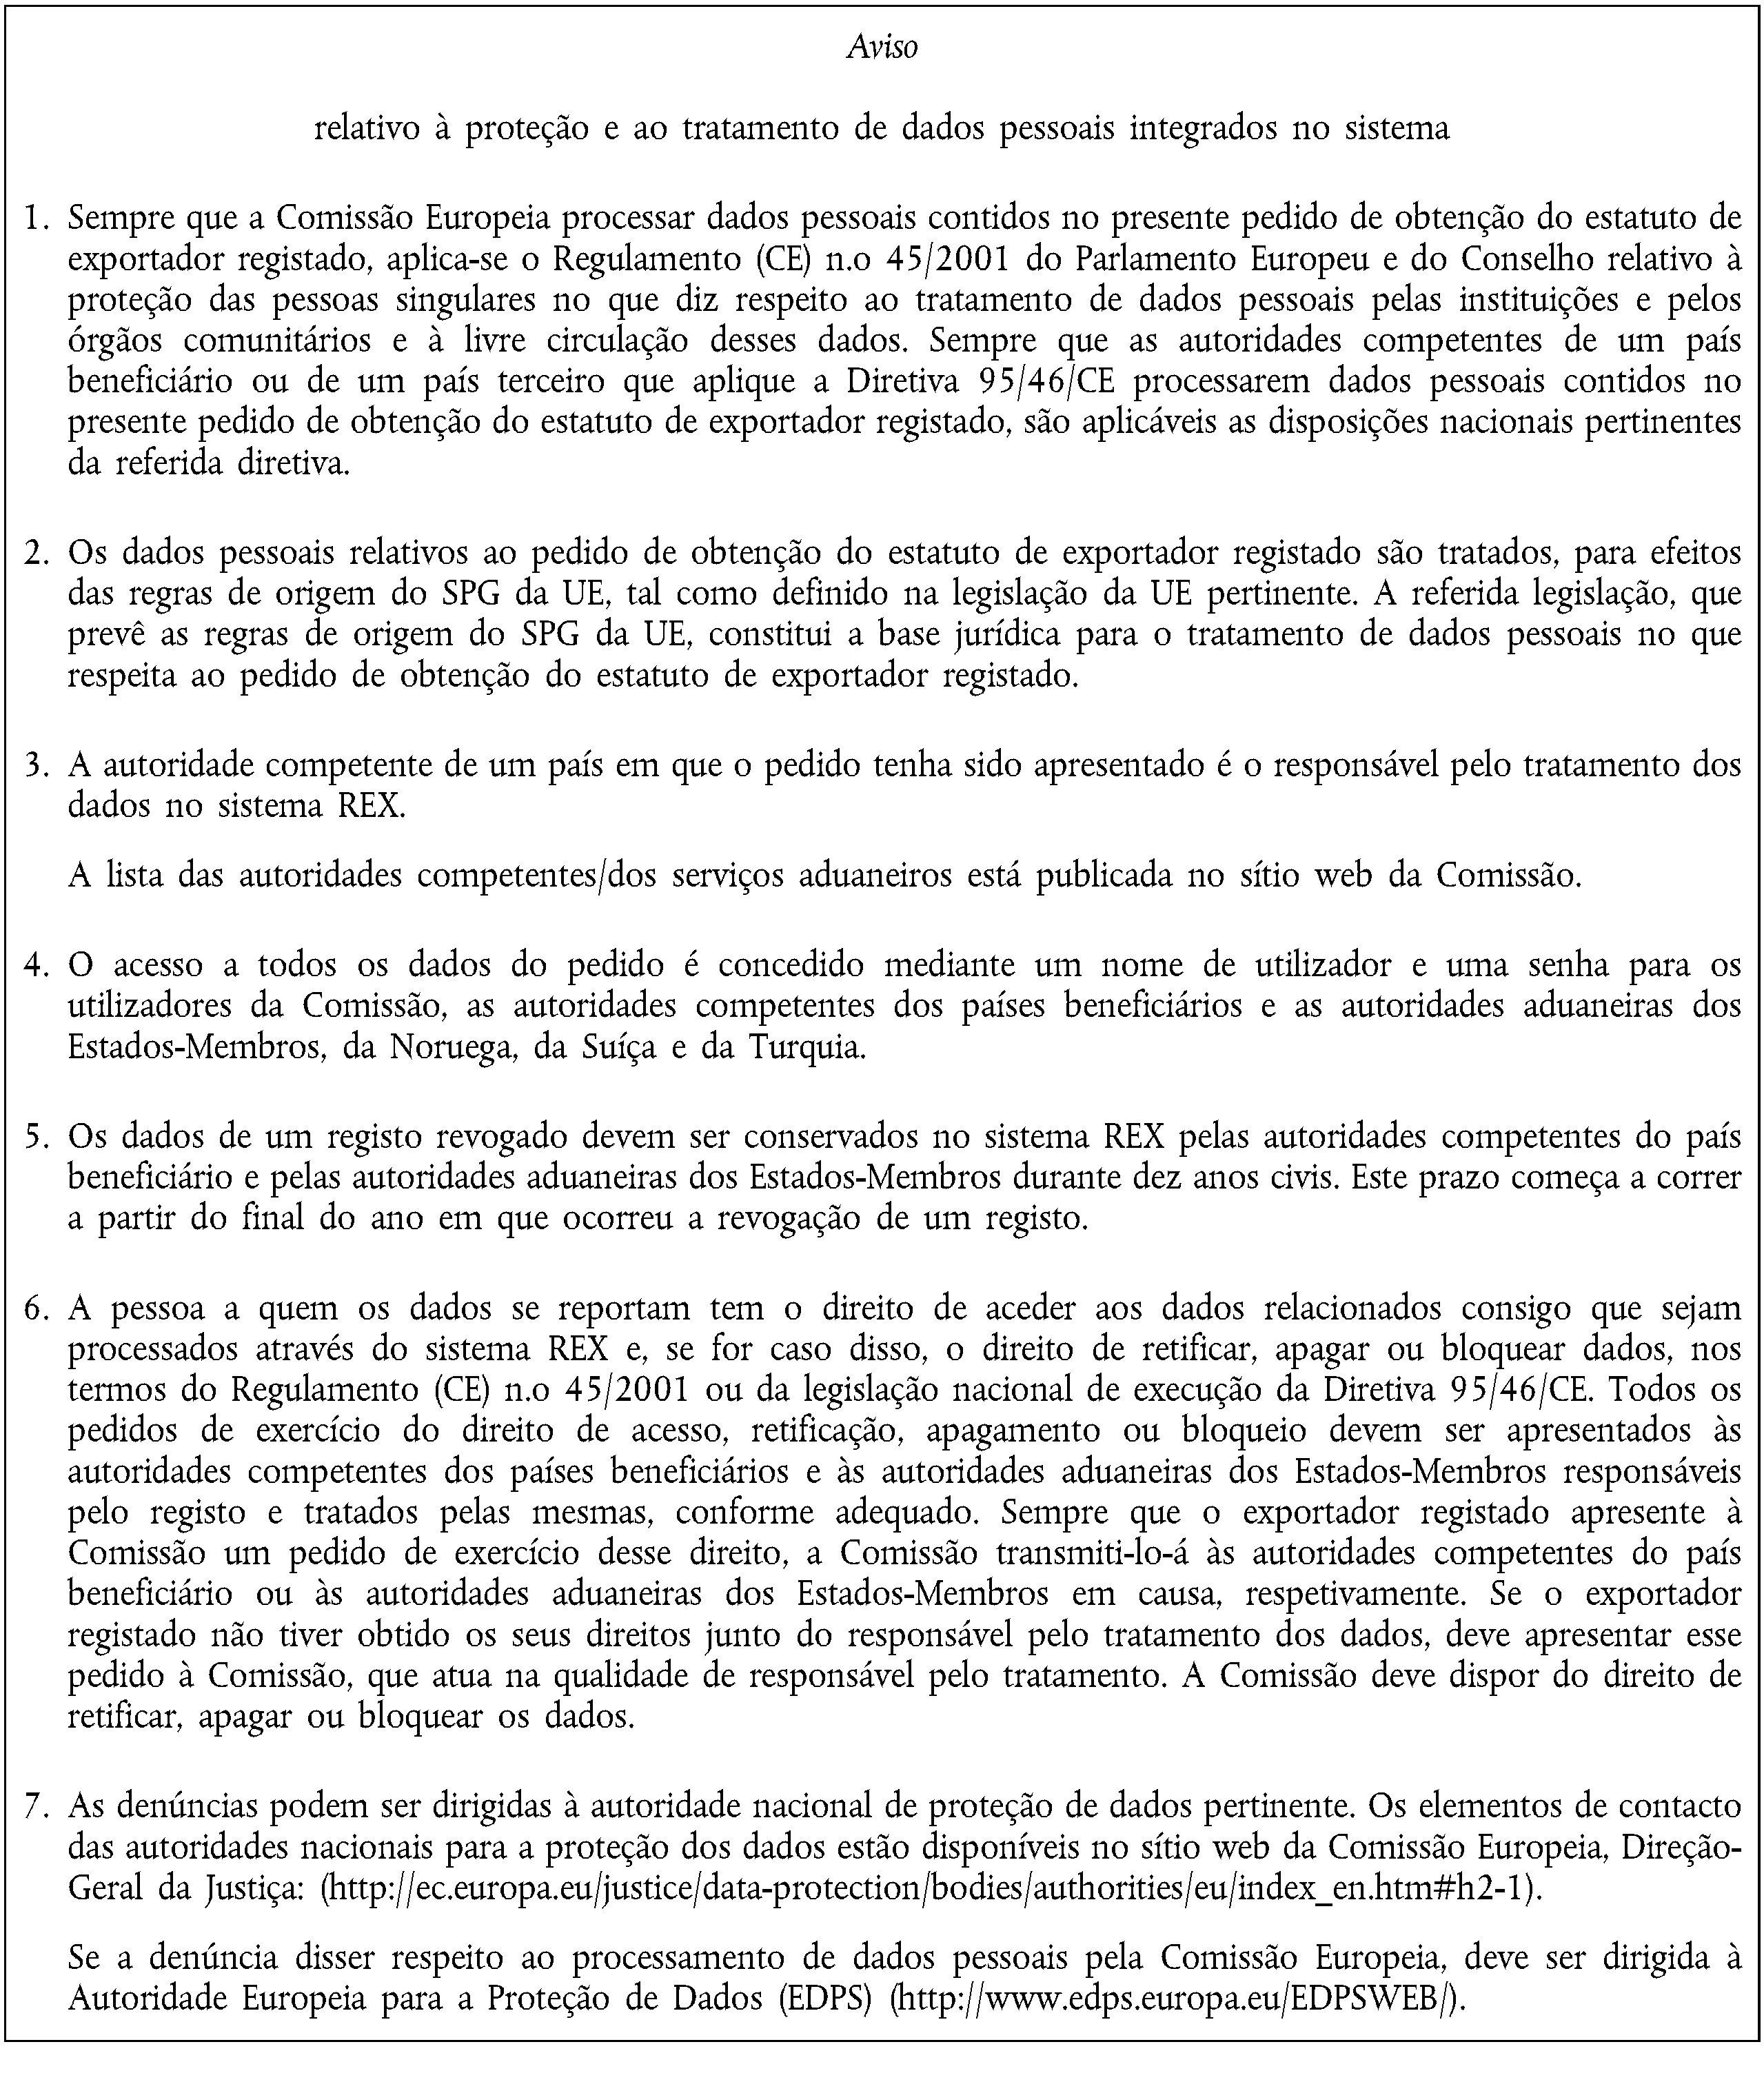 eur lex 02015r2447 20151229 en eur lex